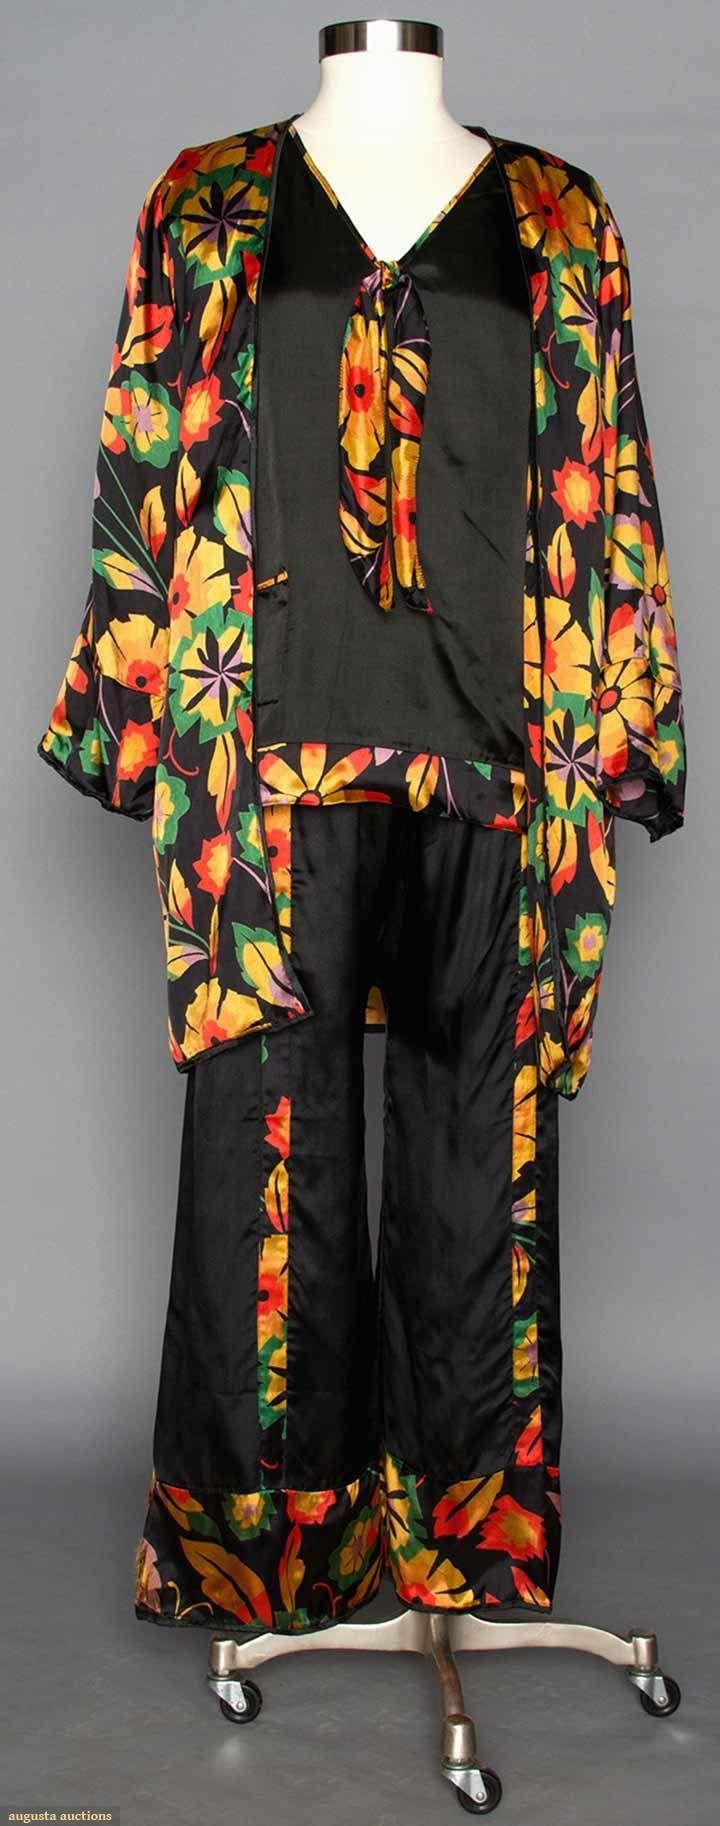 Pajama Sets (image 3)   1920s   silk, satin, rayon   Augusta Auctions   April 9, 2014/Lot 72